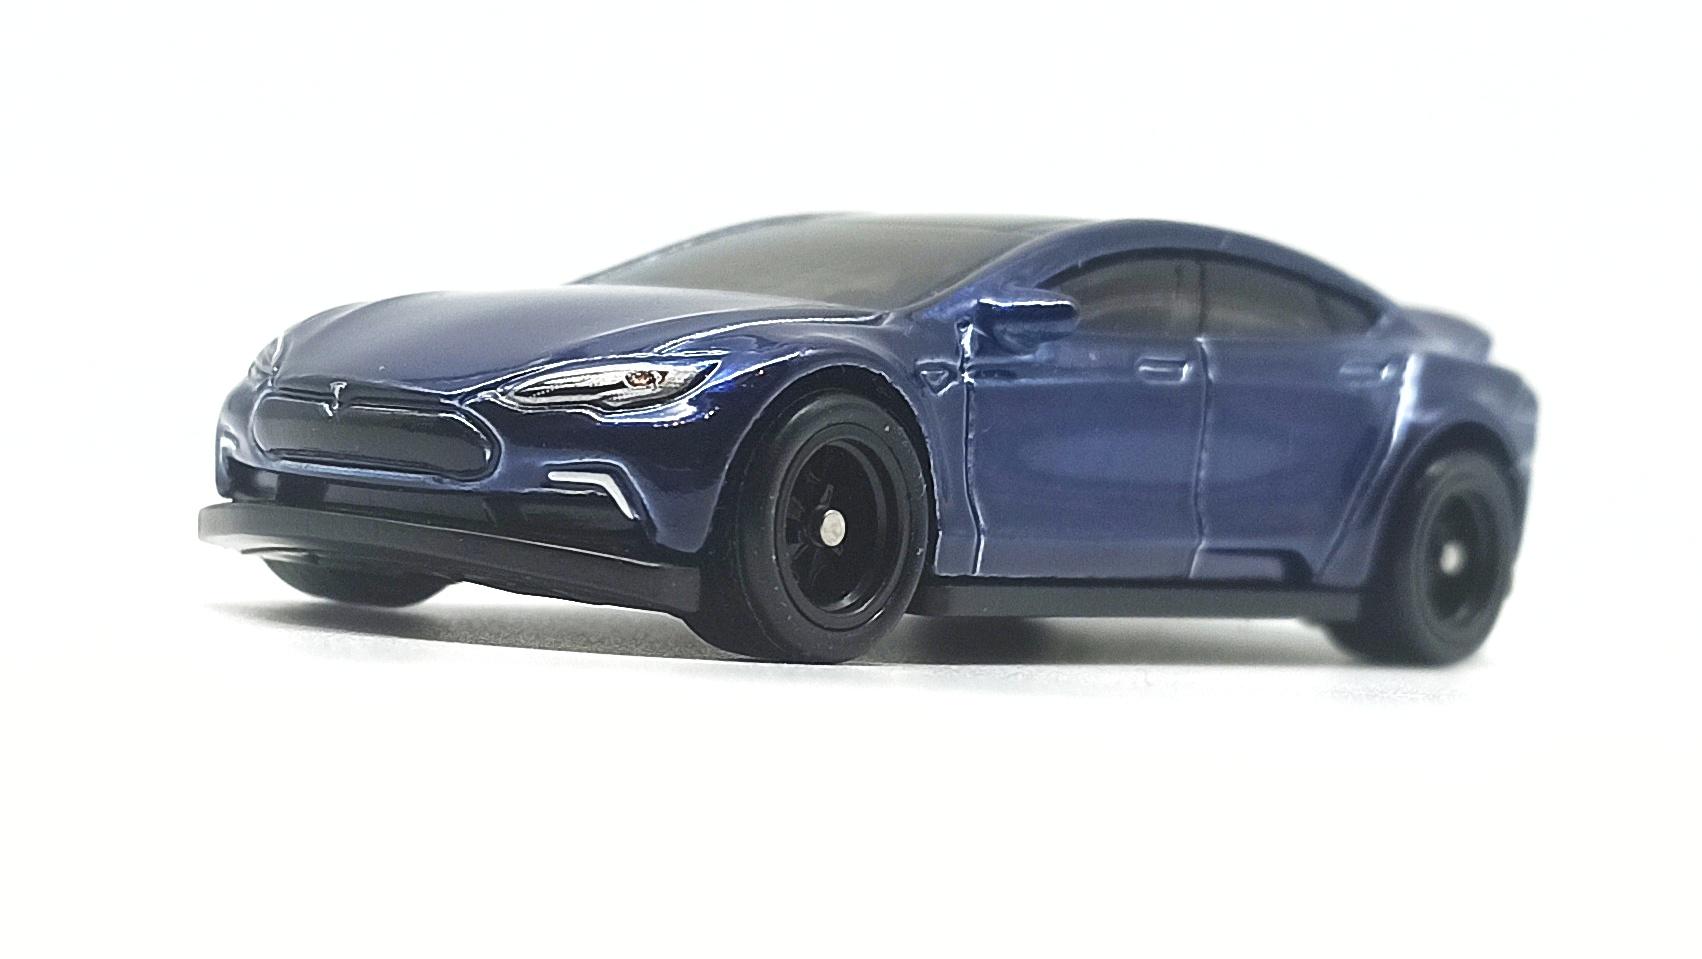 Hot Wheels Tesla Model S (FYG08) 2019 (226/250) HW Green Speed (4/5) indigo blue Super Treasure Hunt (STH) side angle